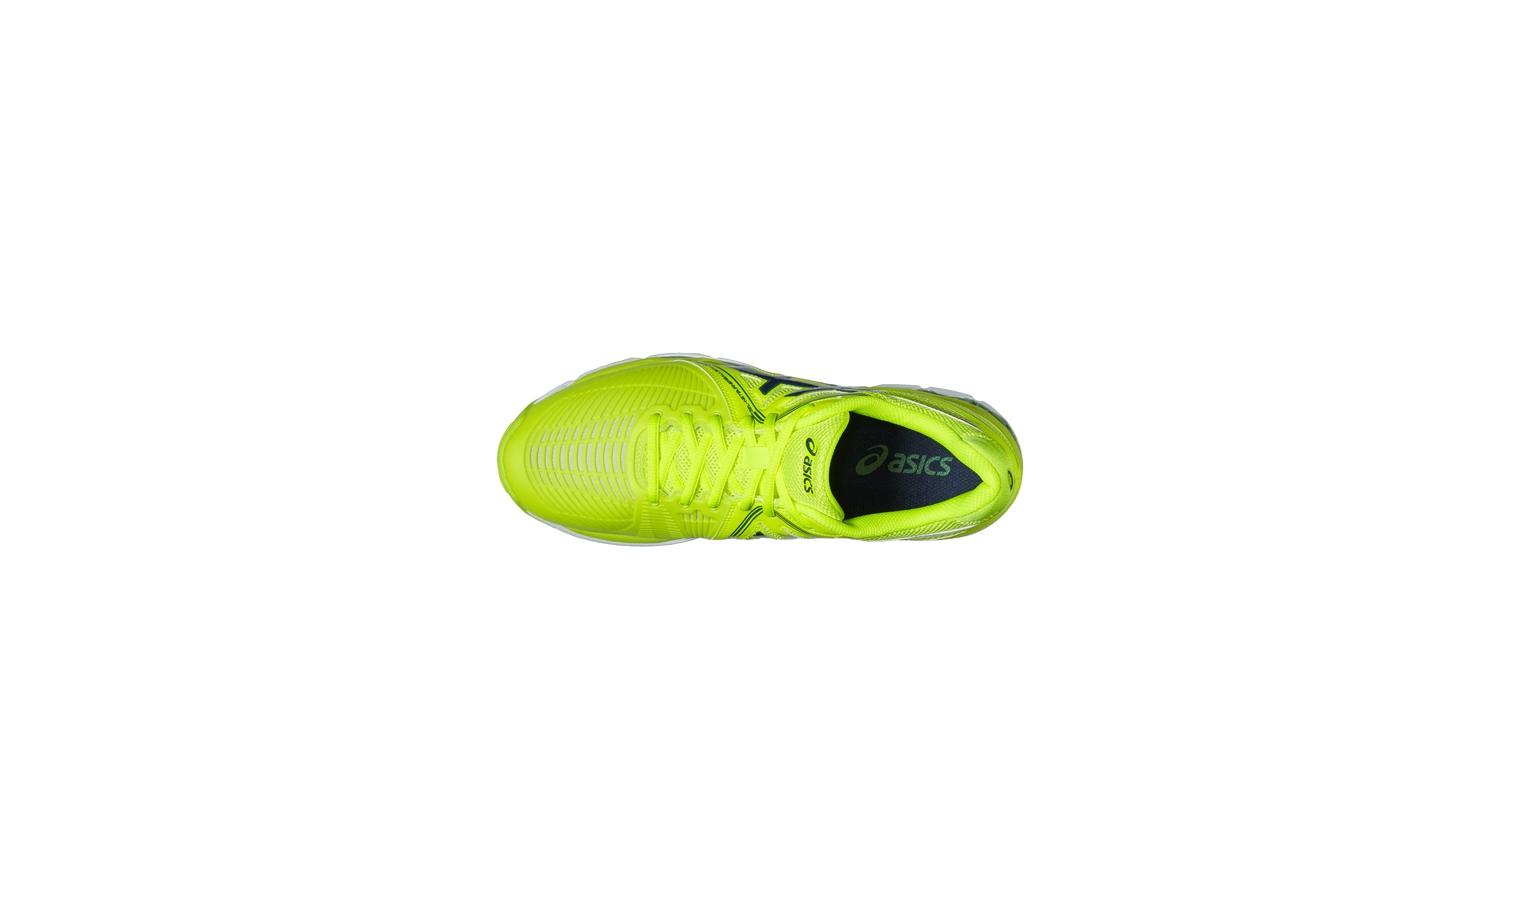 ... Pánská sálová obuv Asics GEL-NETBURNER BALLISTIC žlutá. 0 Kč 35ac6ce2372